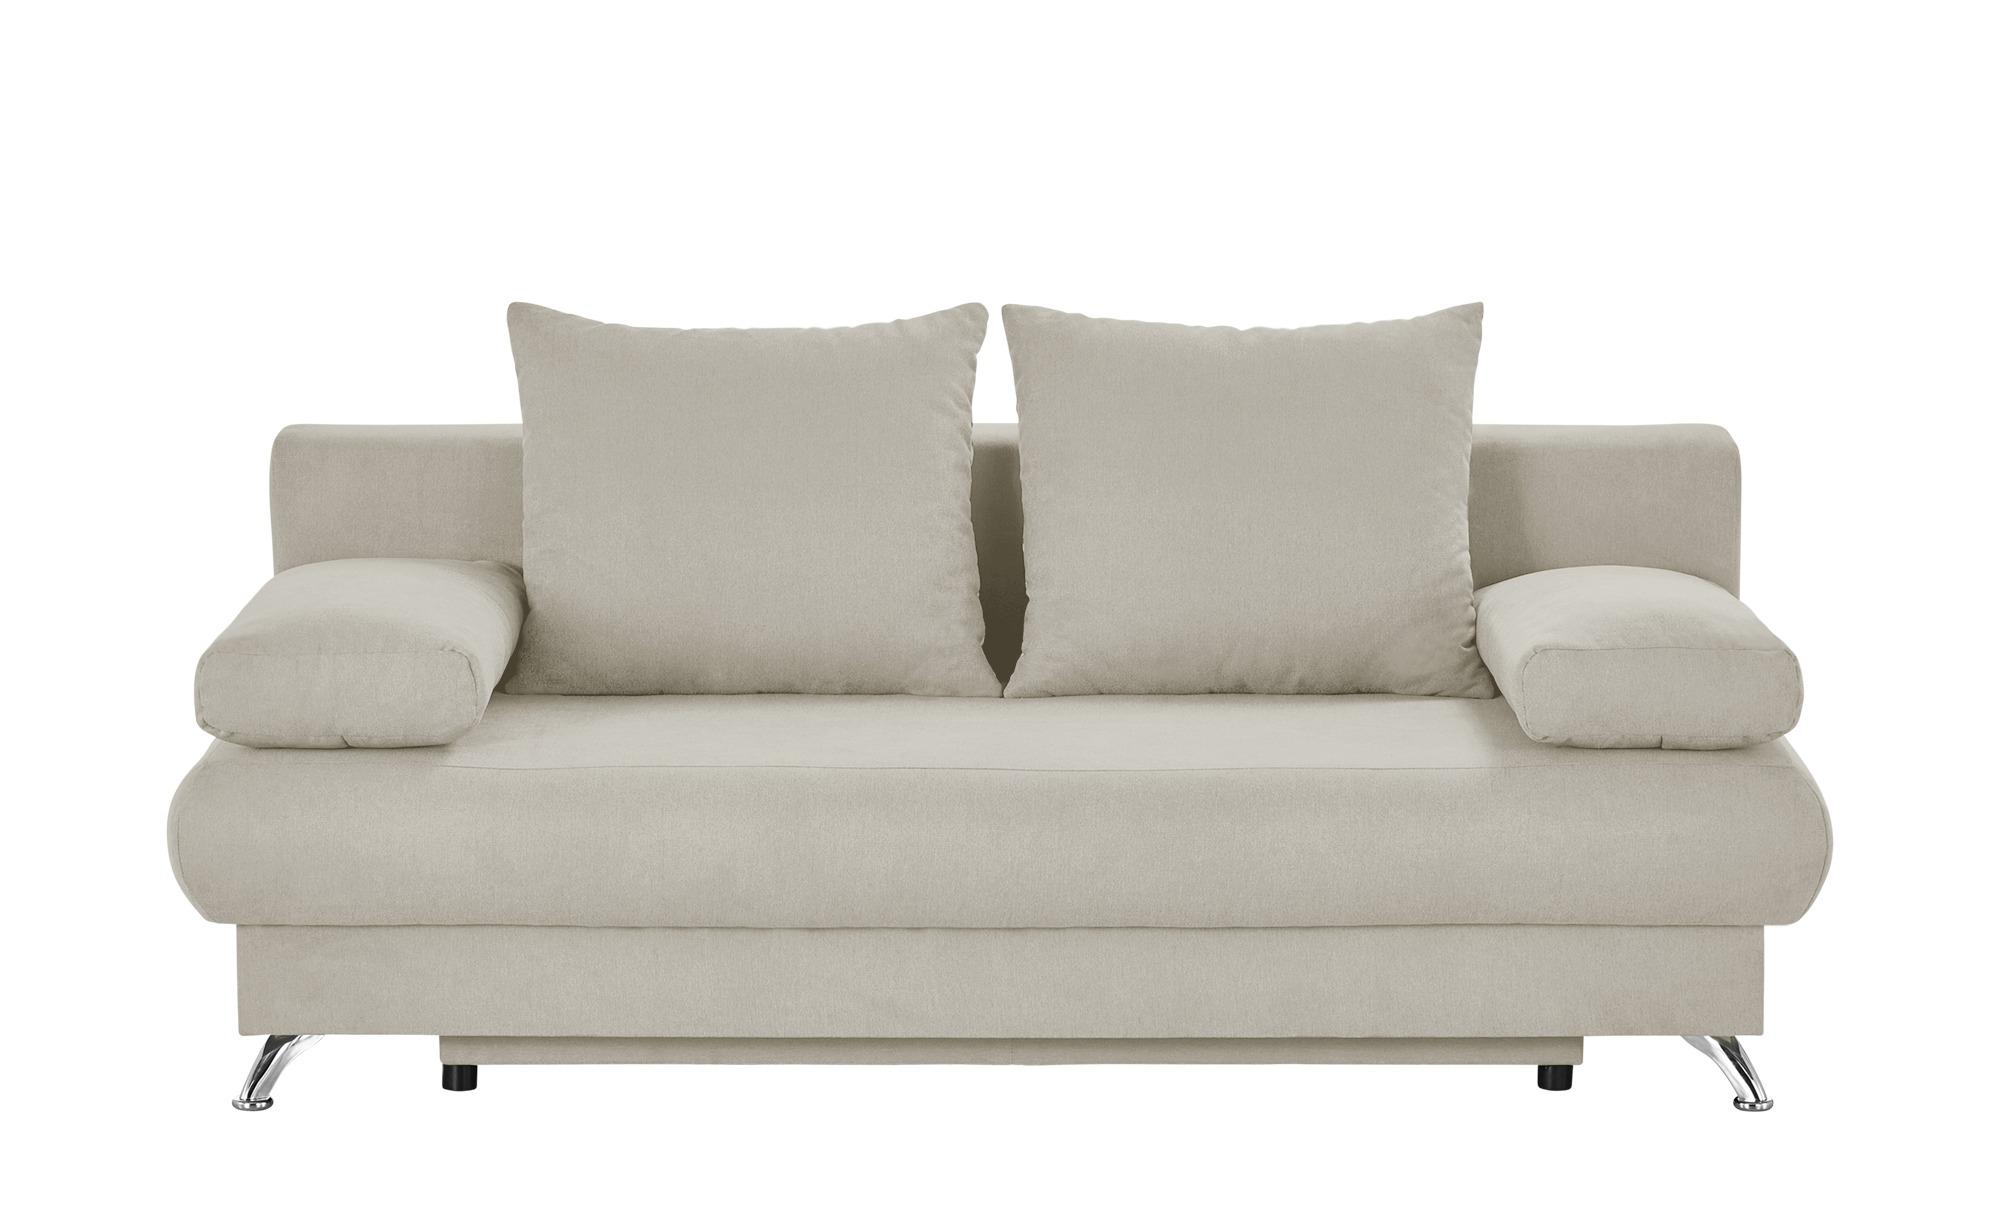 Schlafsofa weiß - Flachgewebe